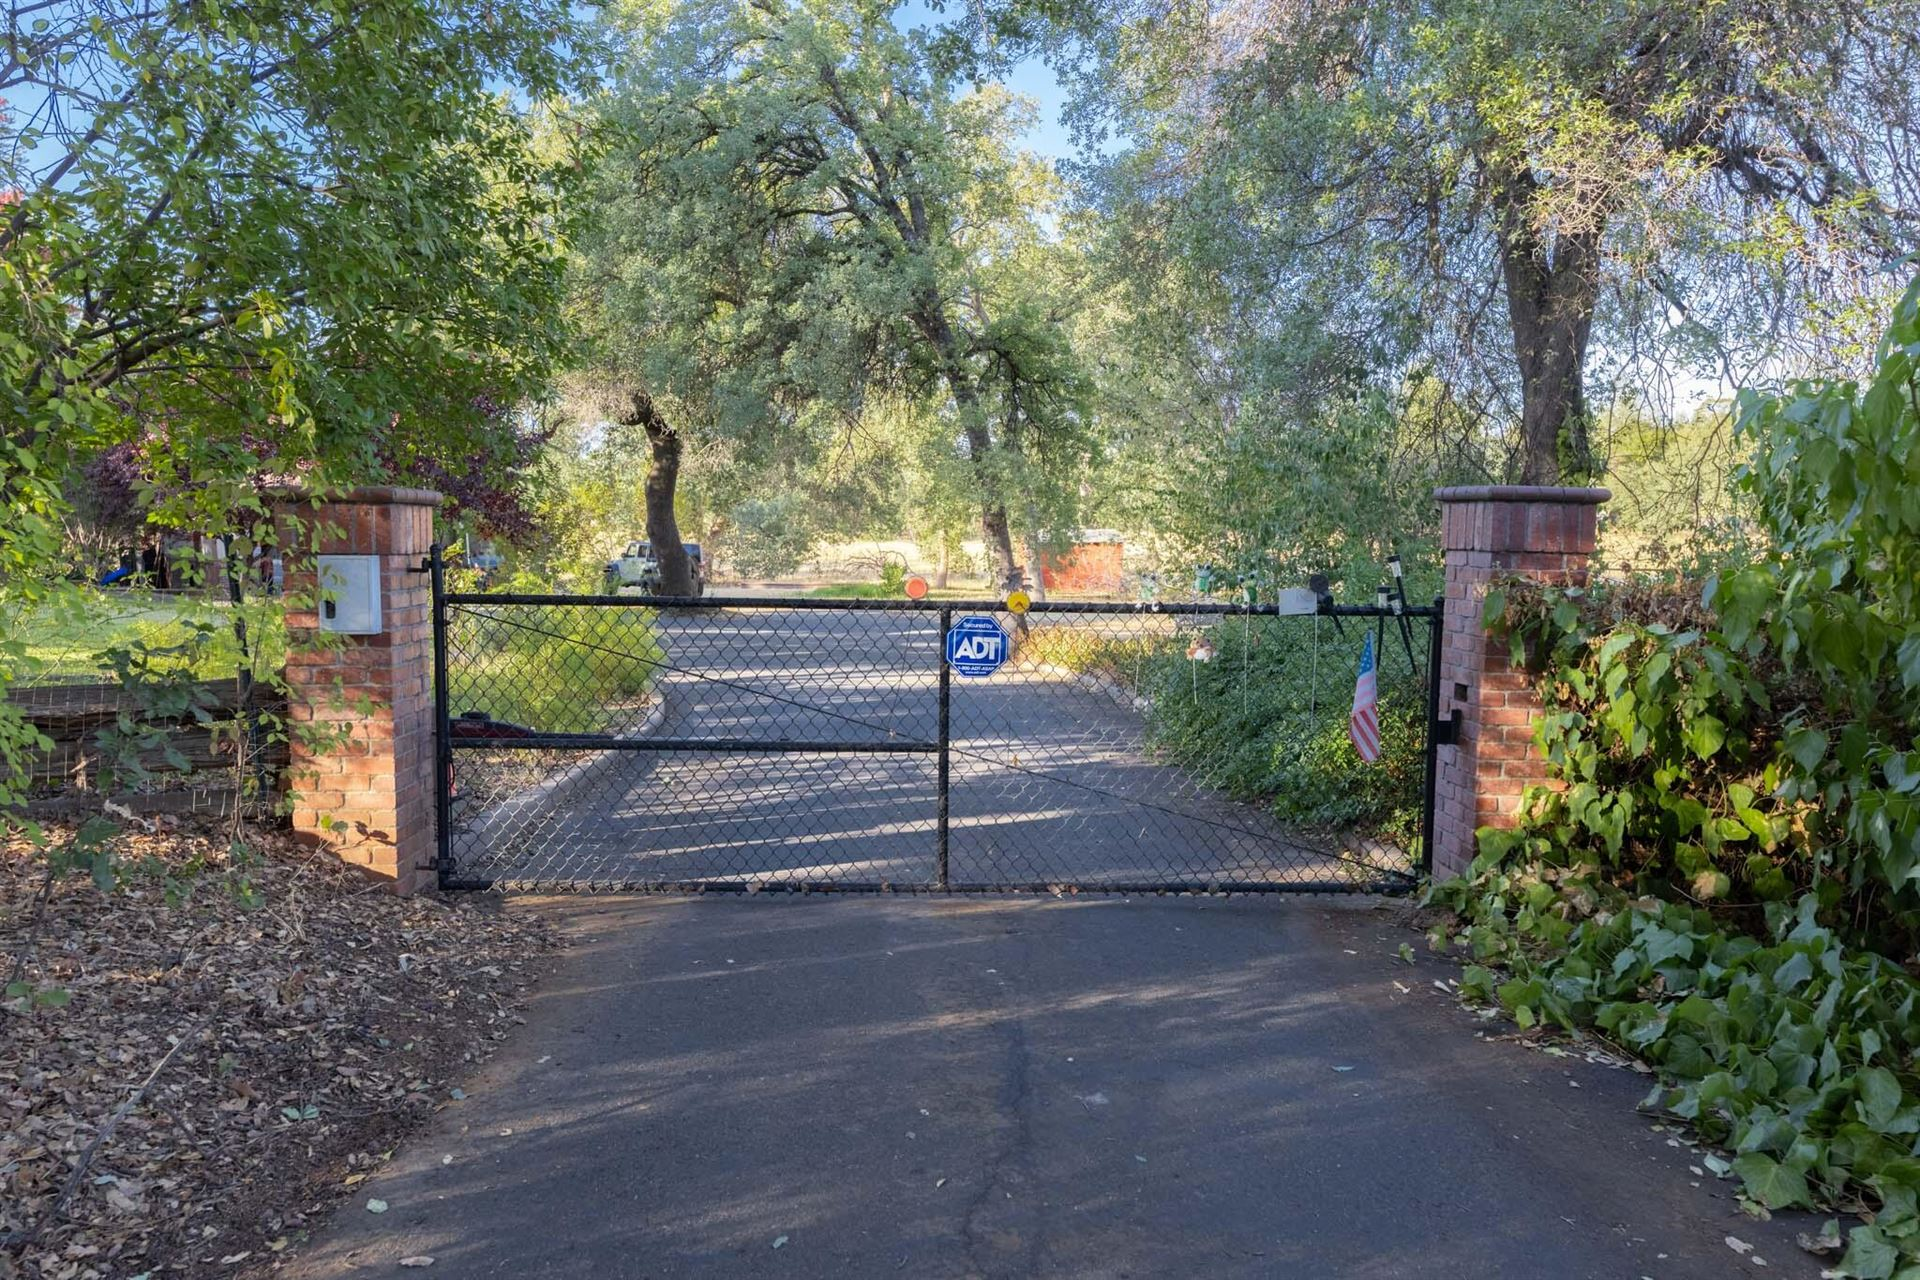 Photo of 1162 Arizona St, Redding, CA 96002 (MLS # 21-4880)